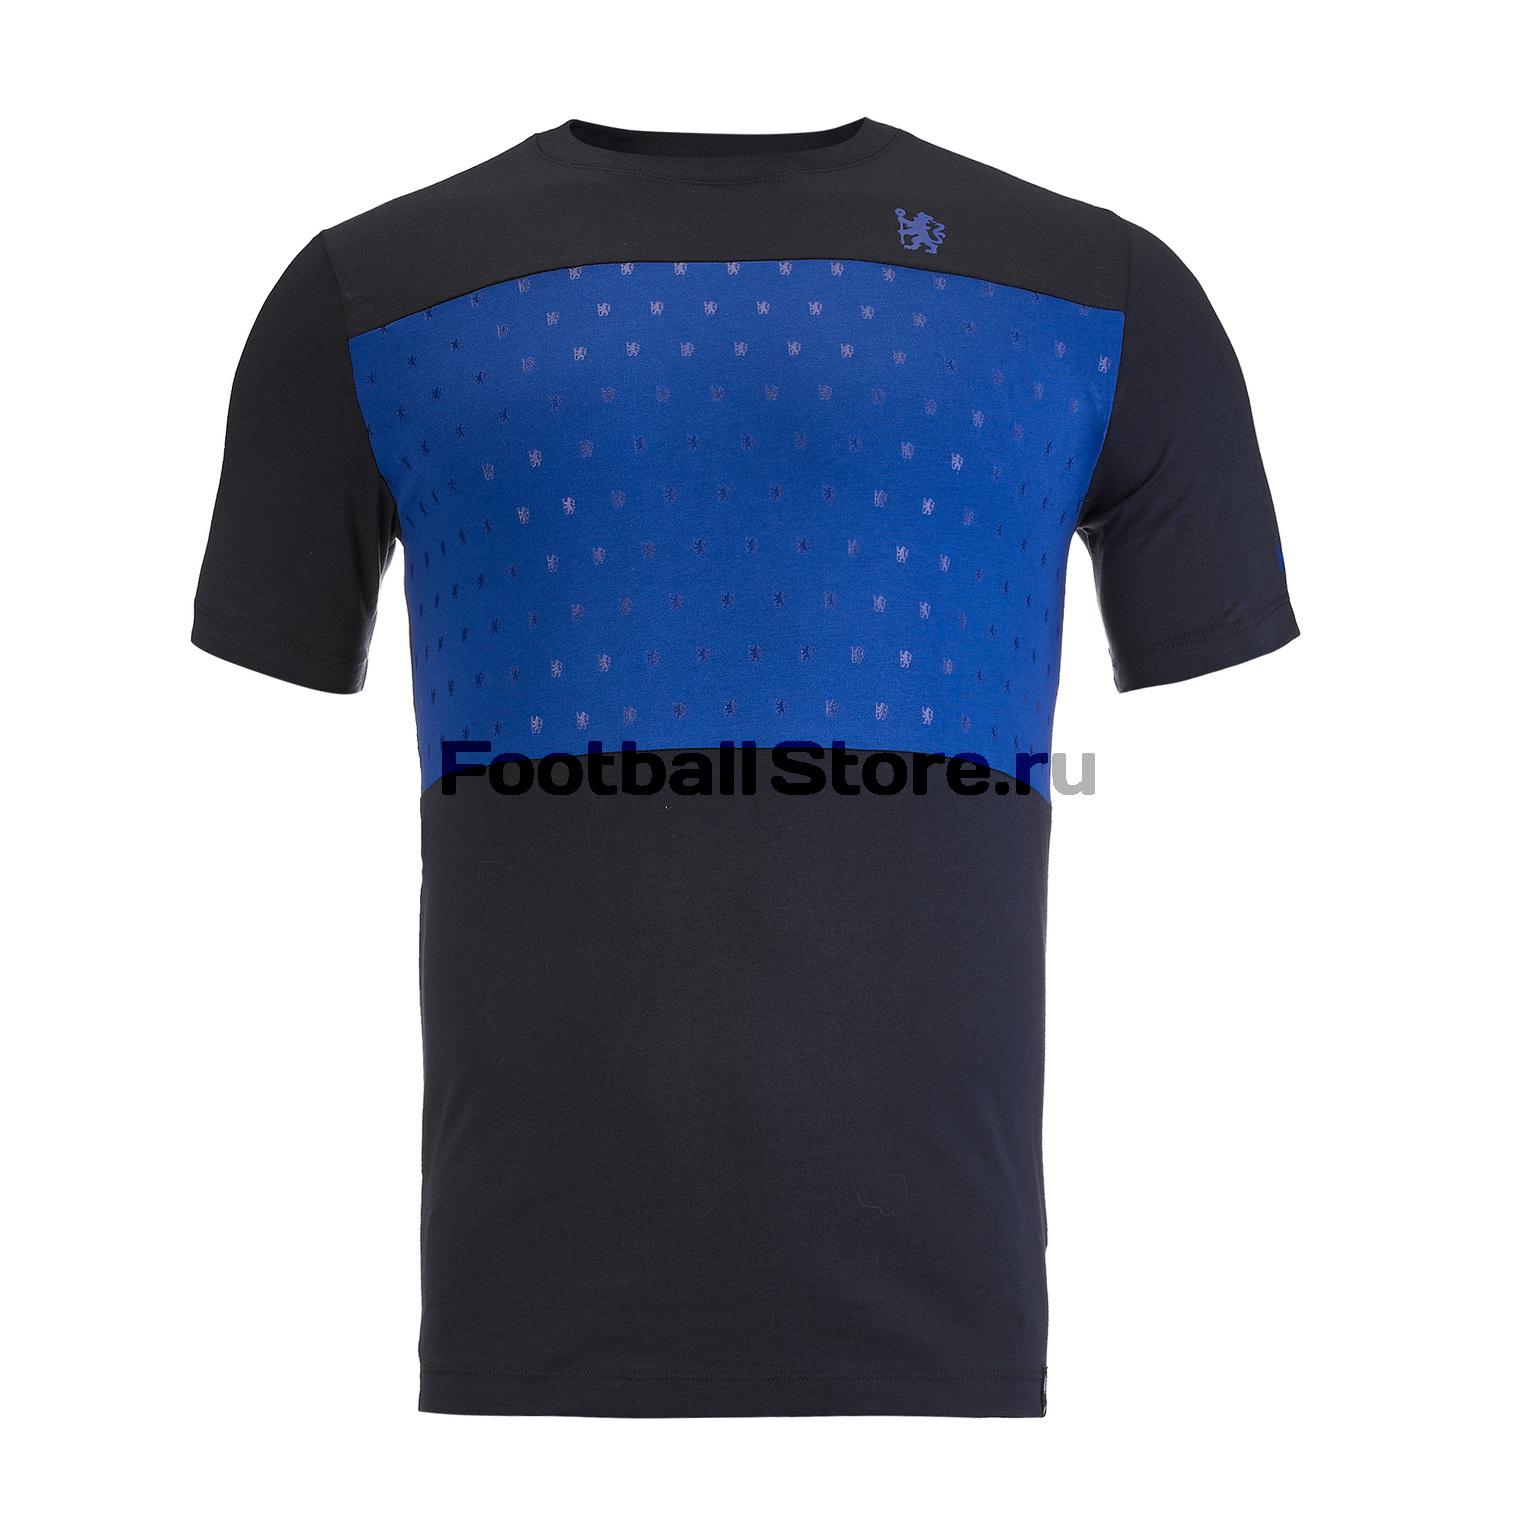 Футболка хлопковая Nike Chelsea Tee Crest AQ7461-475 футболка хлопковая nike tee club19 ss aj1504 451